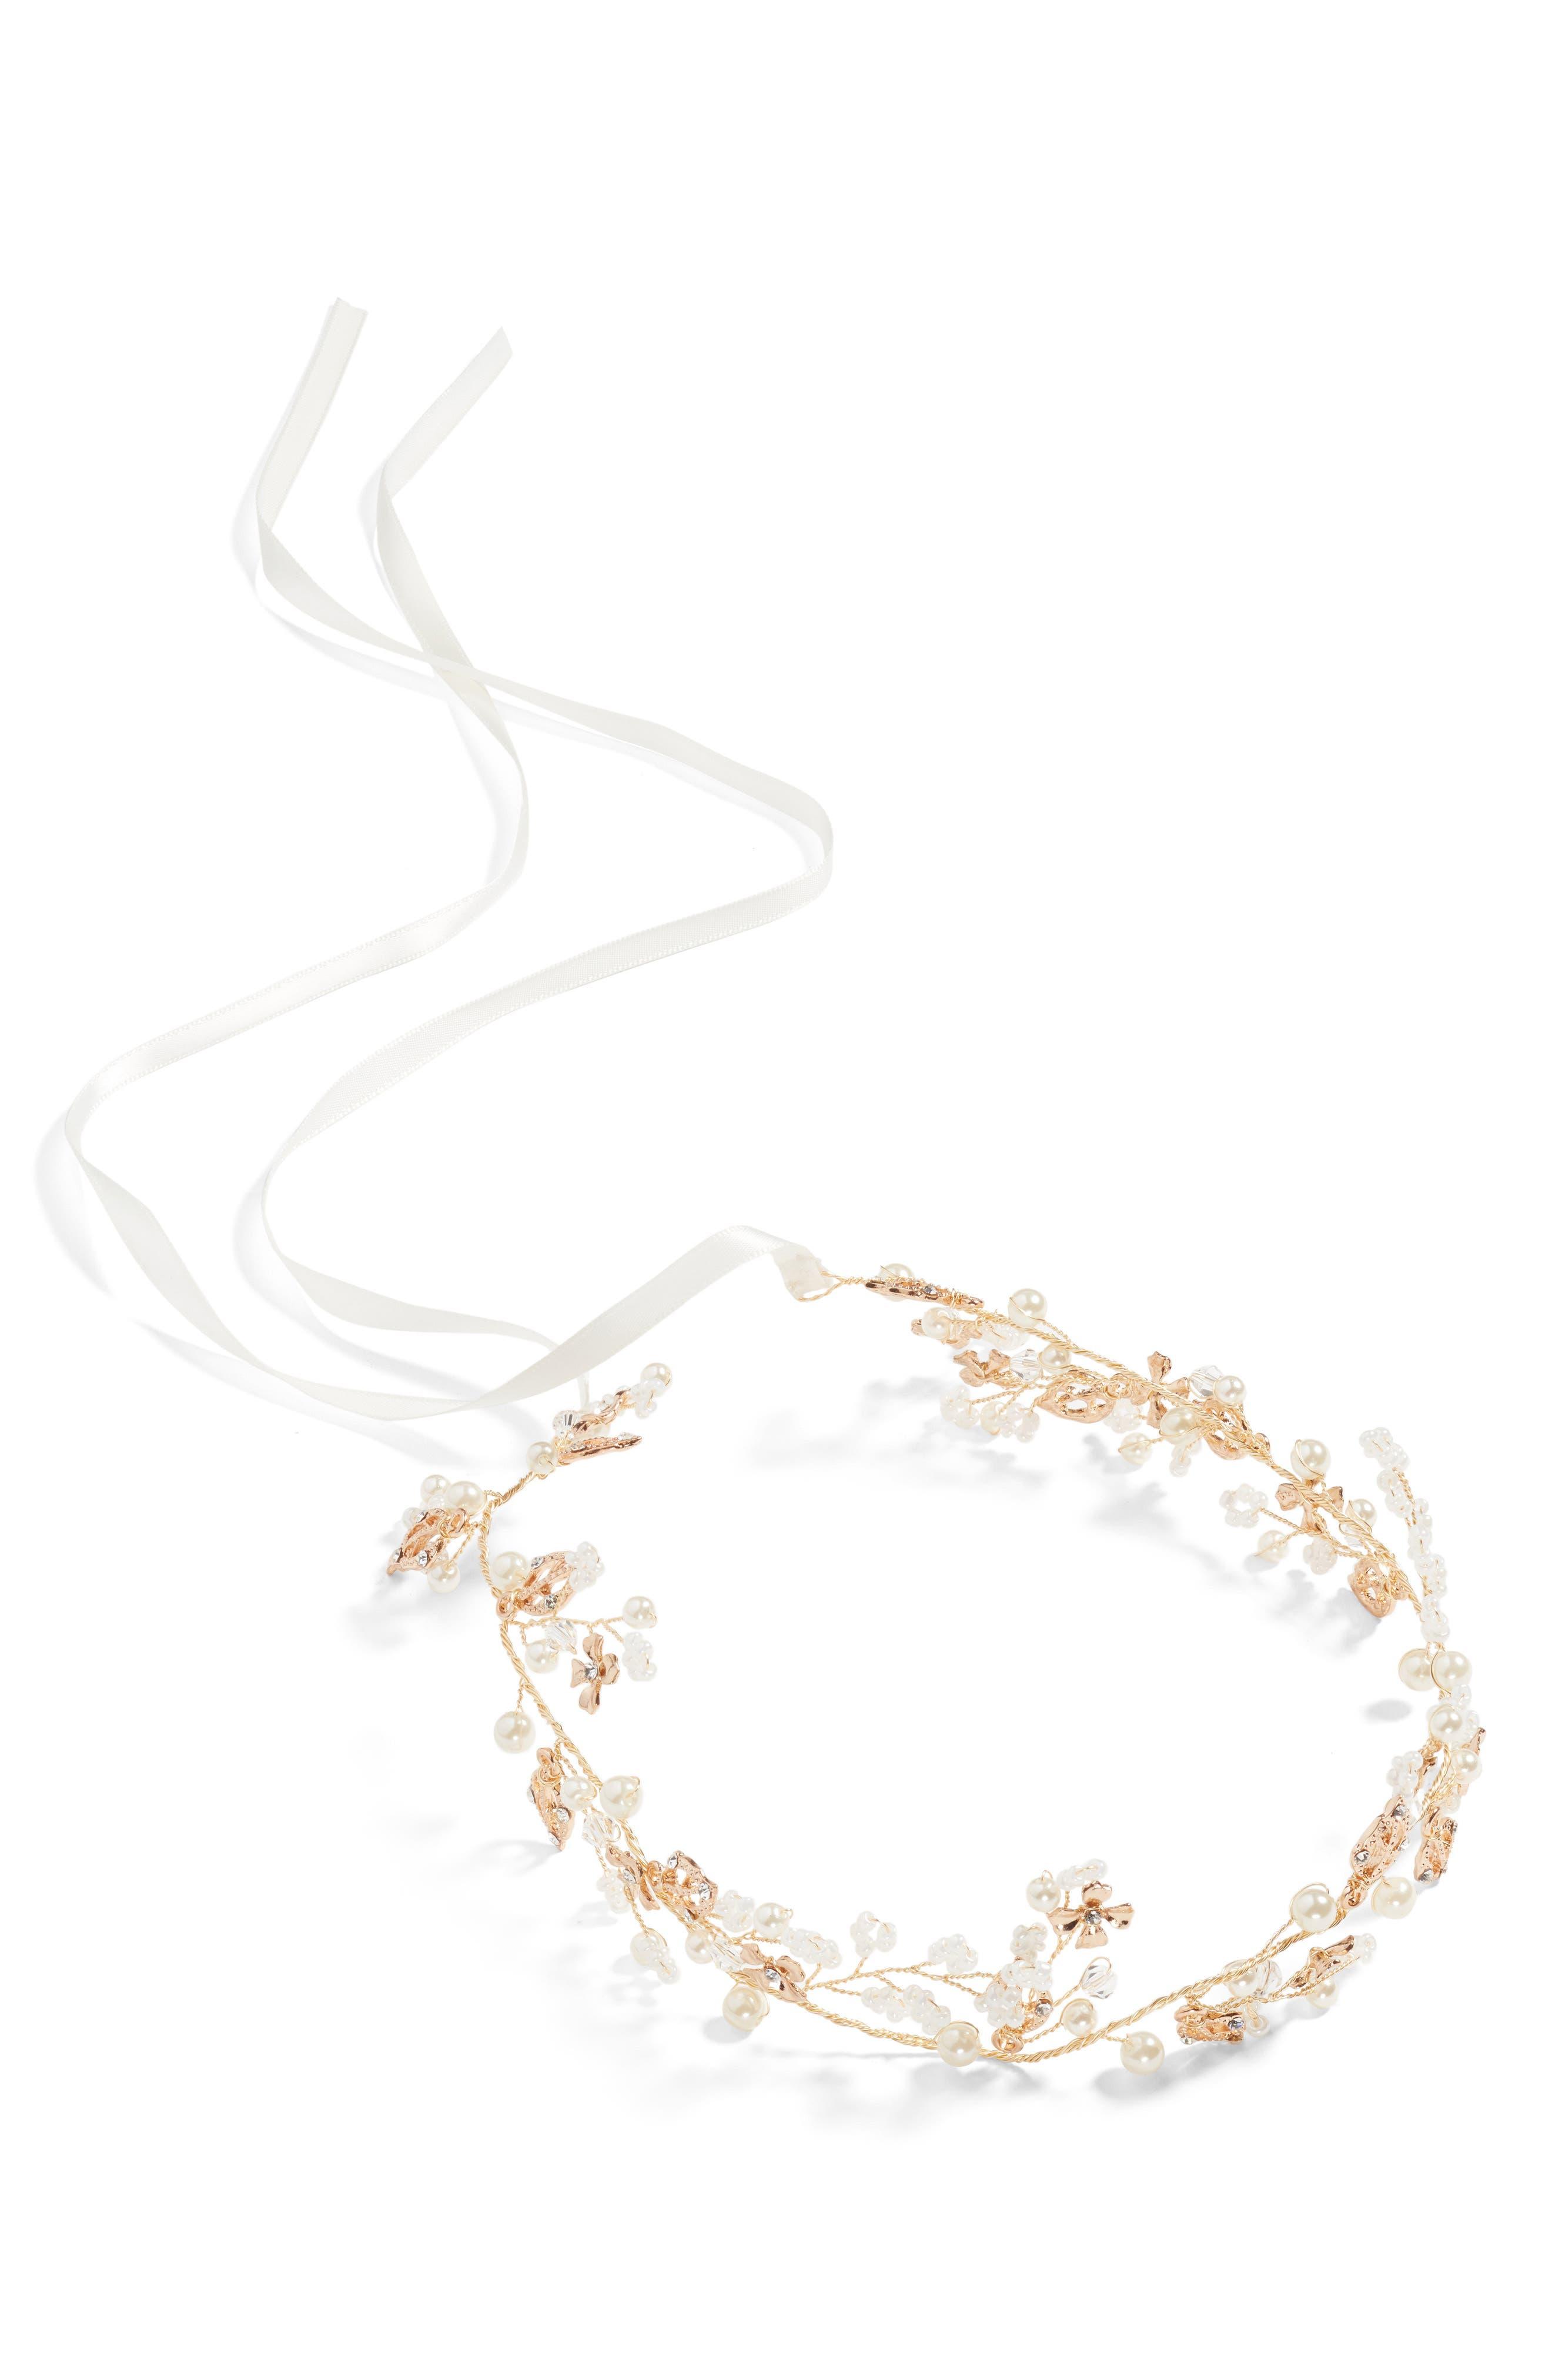 J-PICONE Imitation Pearl & Crystal Headband, Main, color, 710